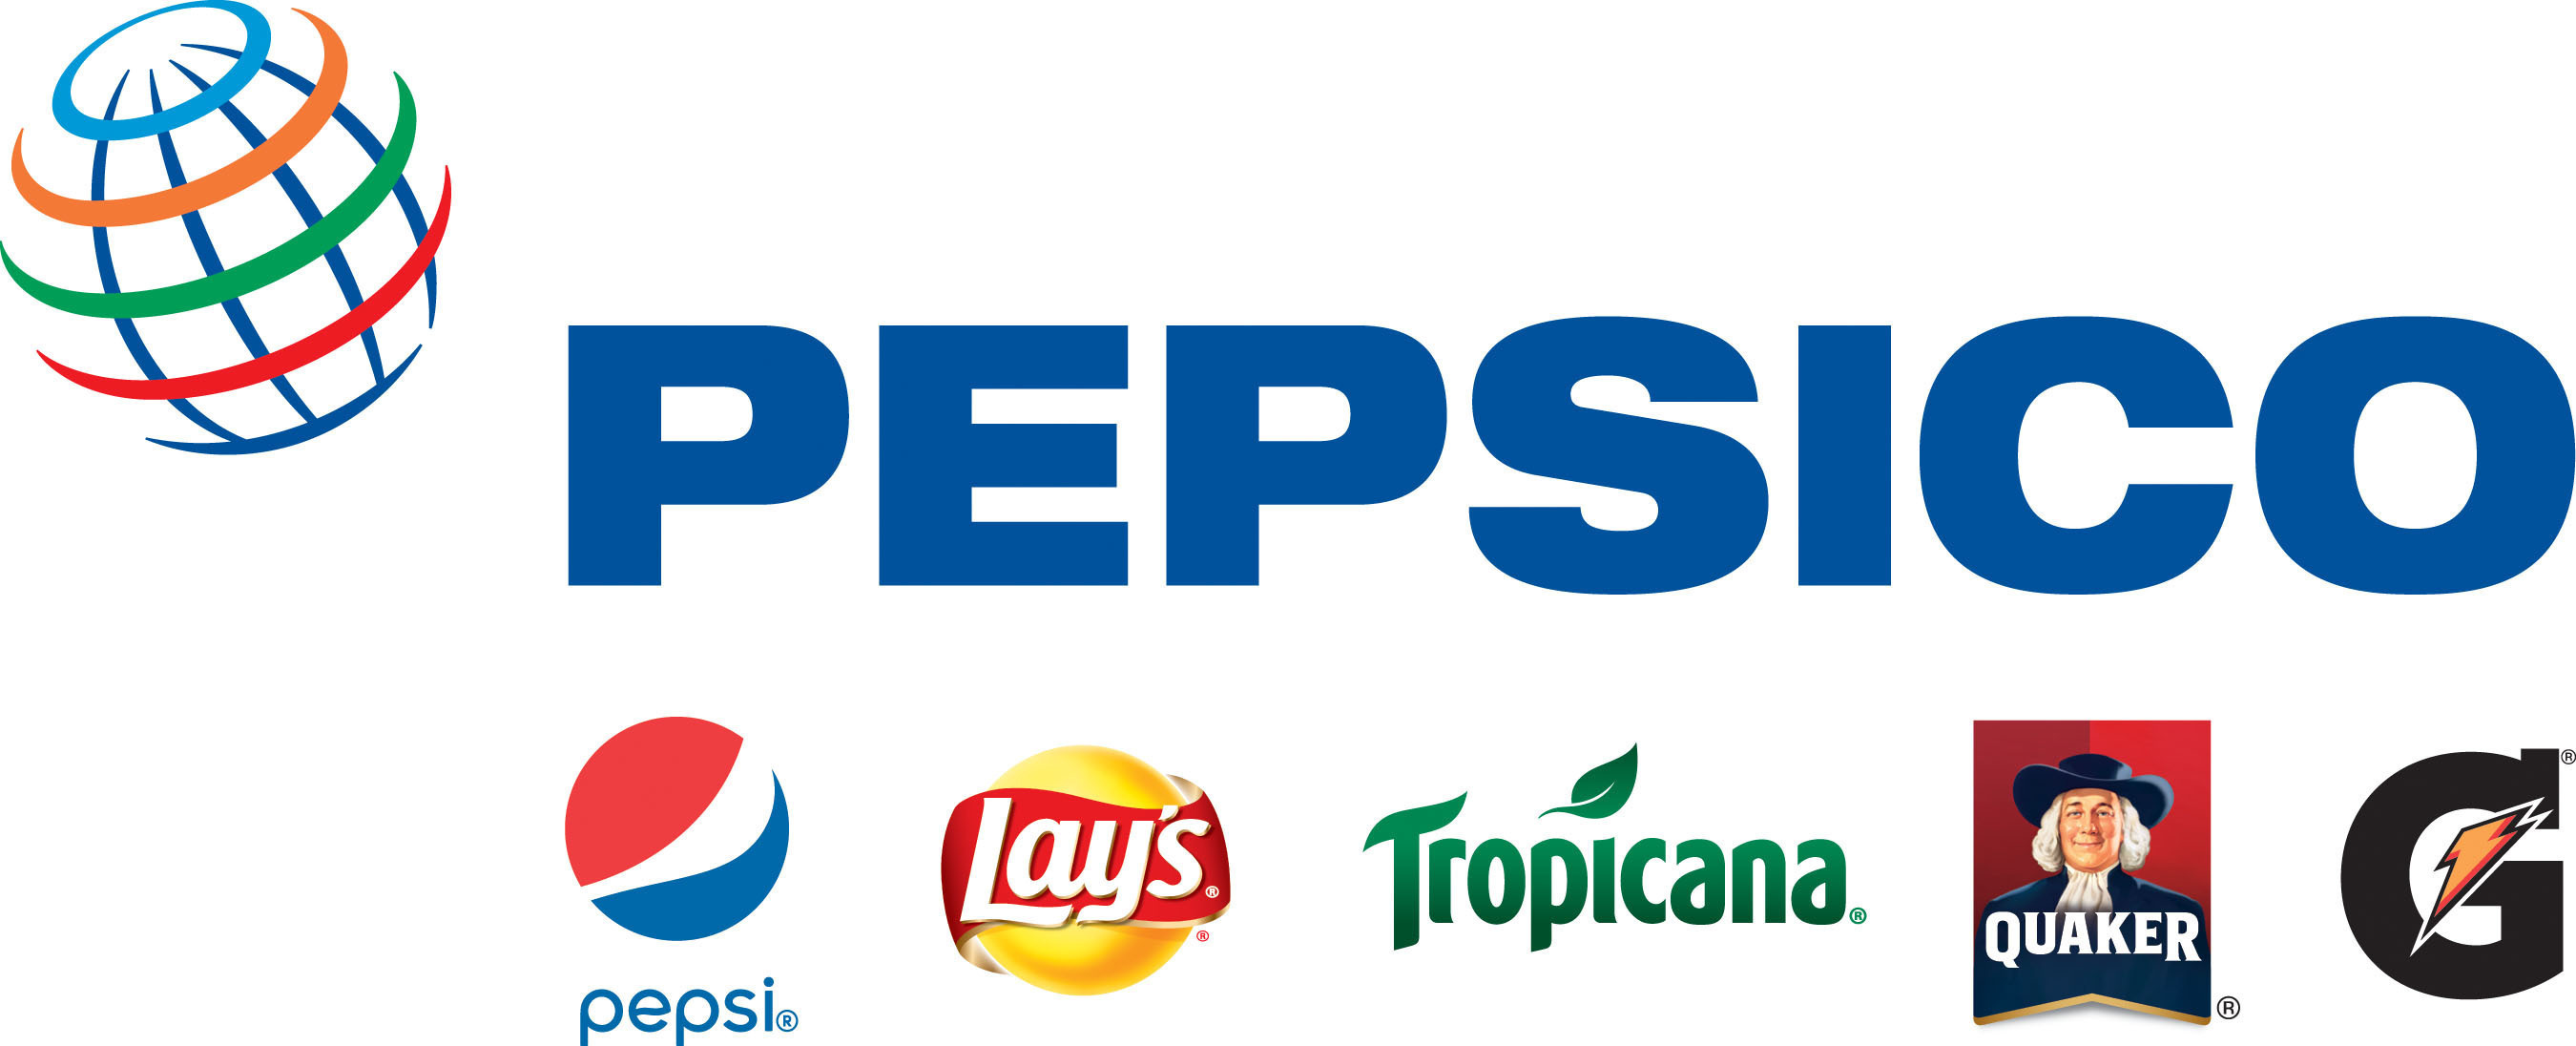 PepsiCo Latinoamérica Innova y expande su portafolio